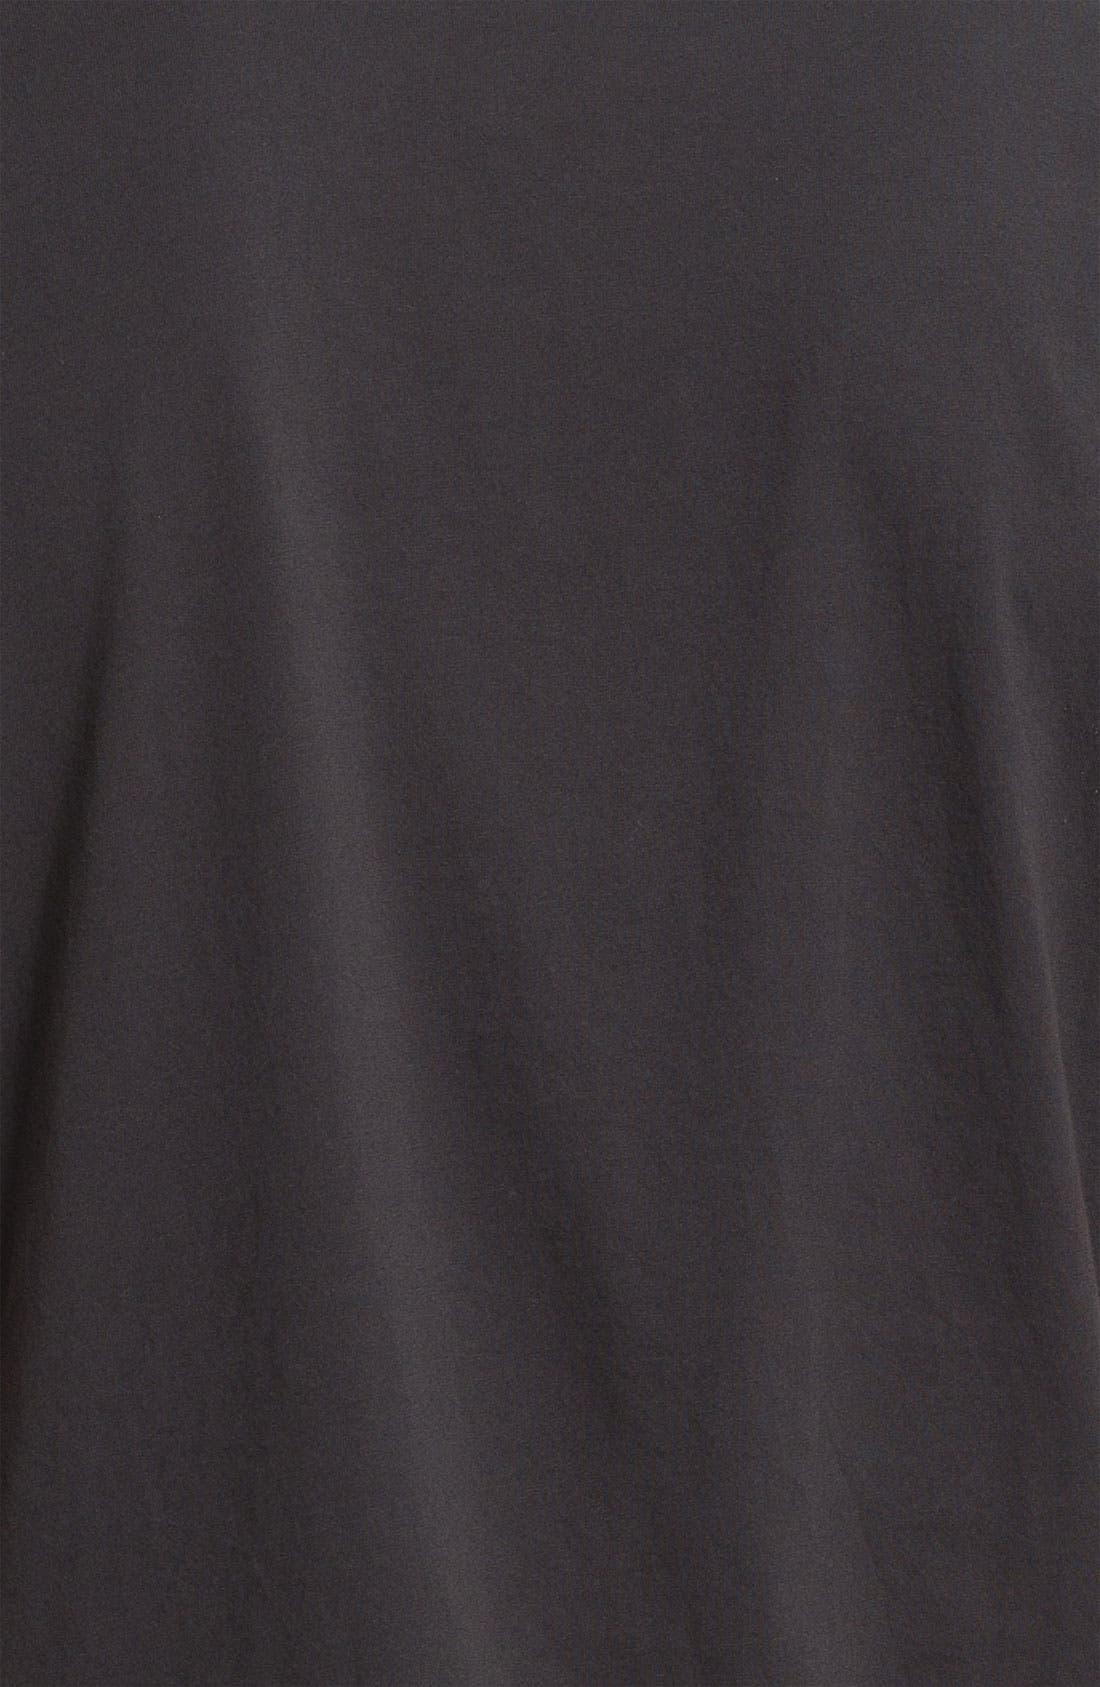 Alternate Image 3  - Scott Free 'All Day I Dream' Graphic T-Shirt